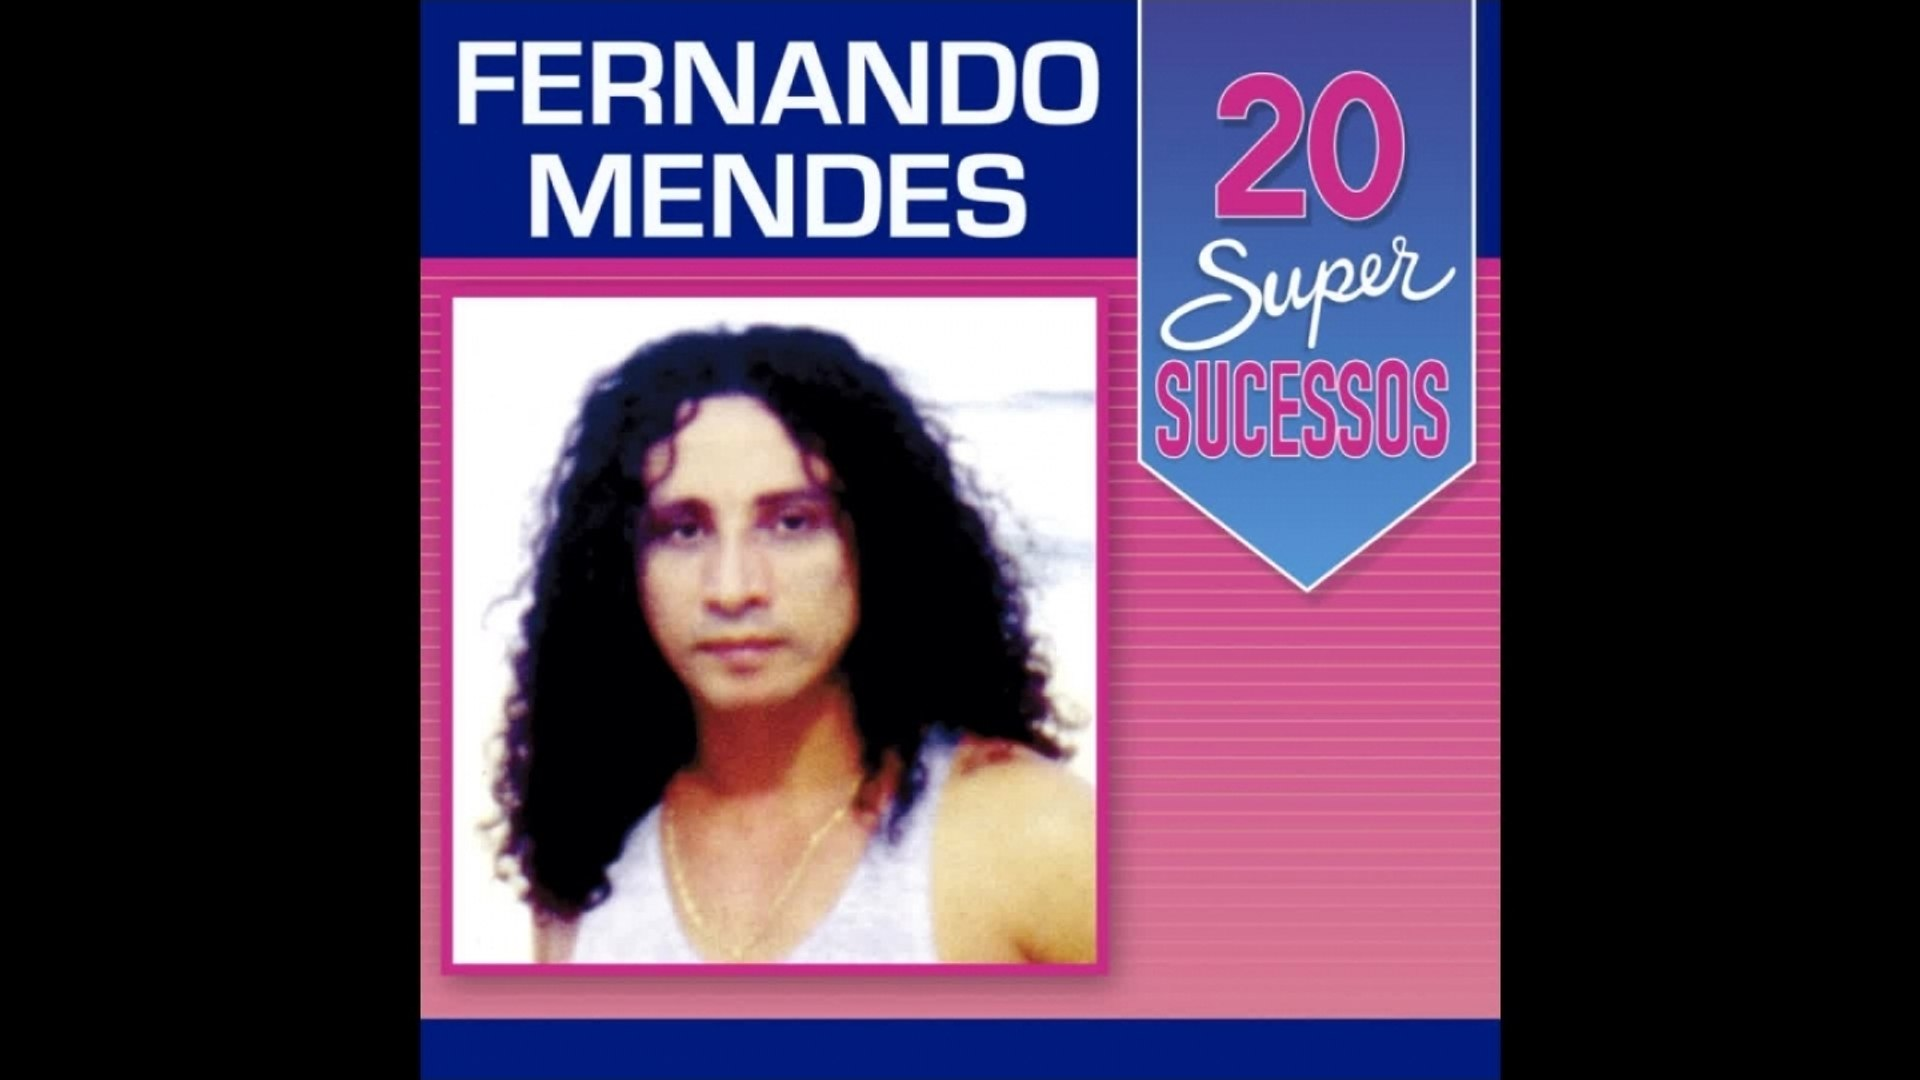 Fernando Mendes - 20 Super Sucessos (Completo / Oficial)